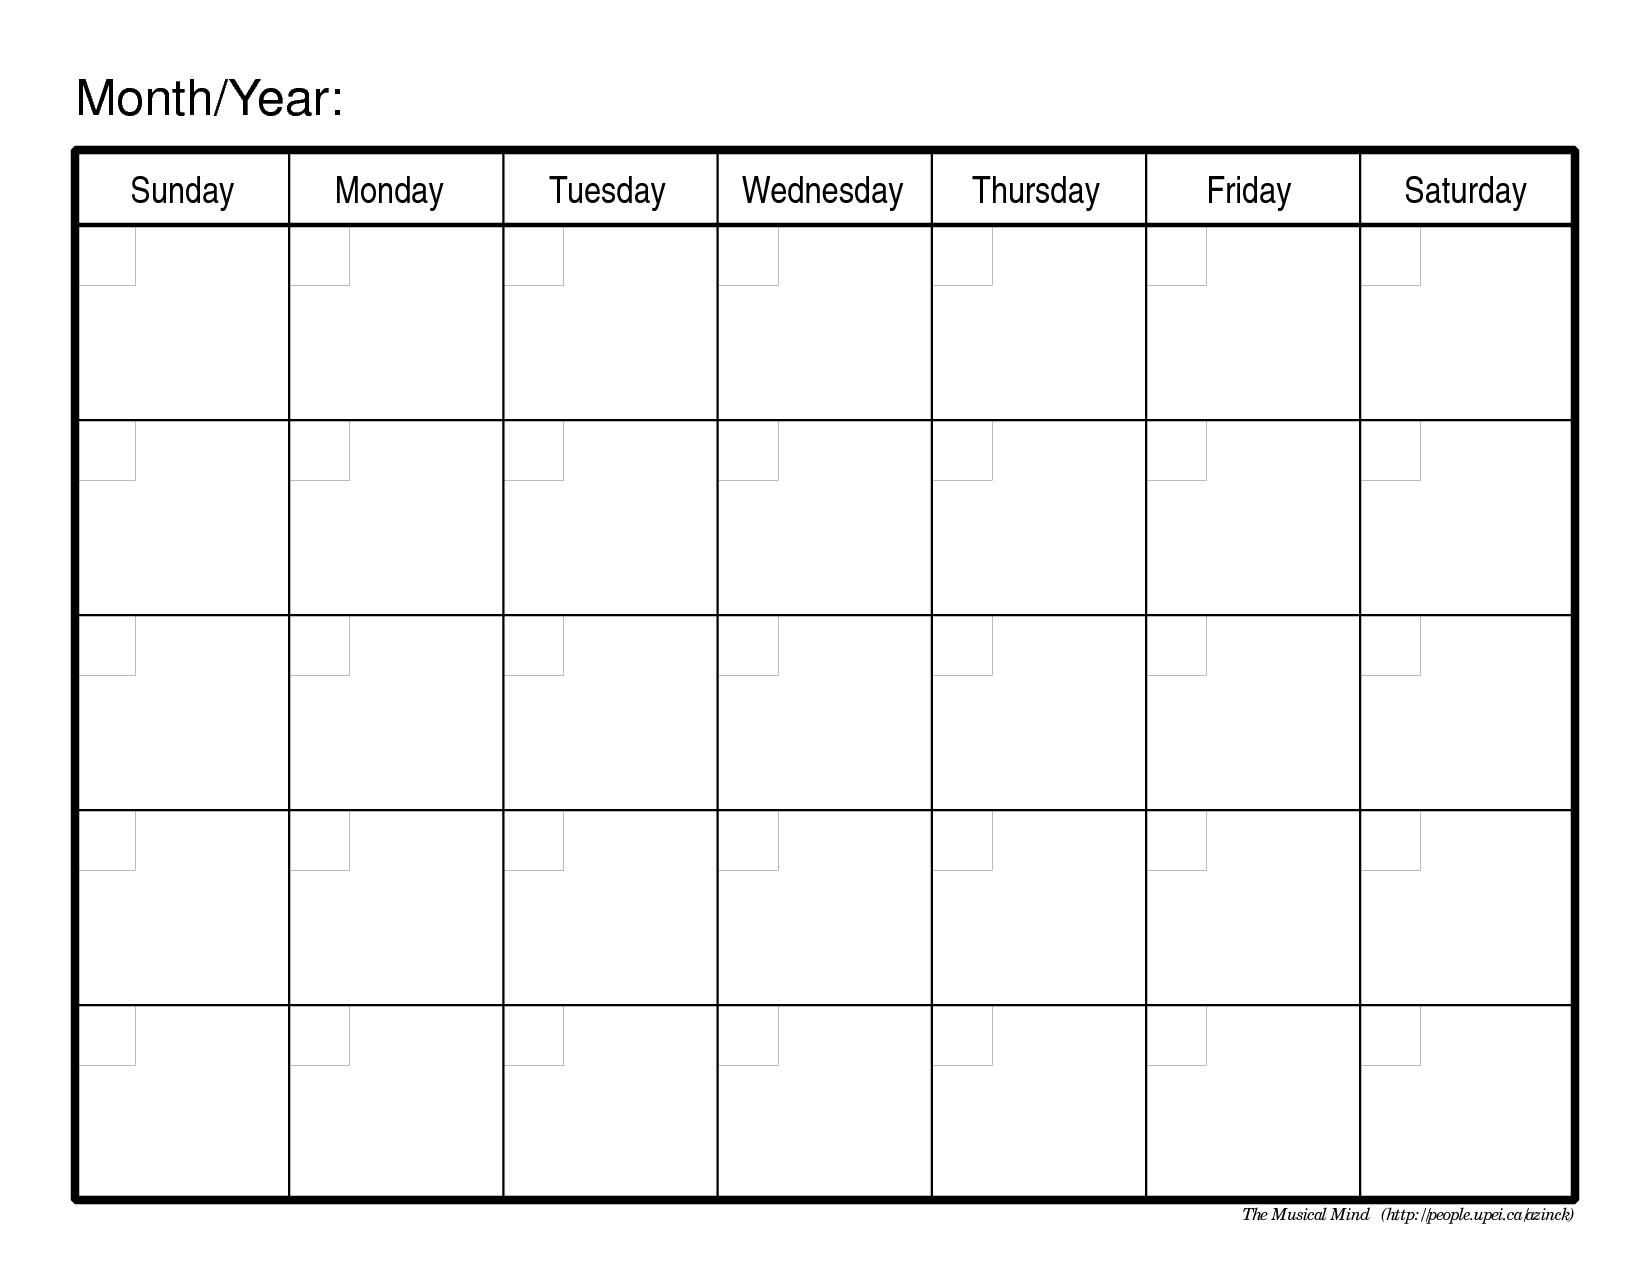 Monthly Calendar Template   Weekly Calendar Template, Blank